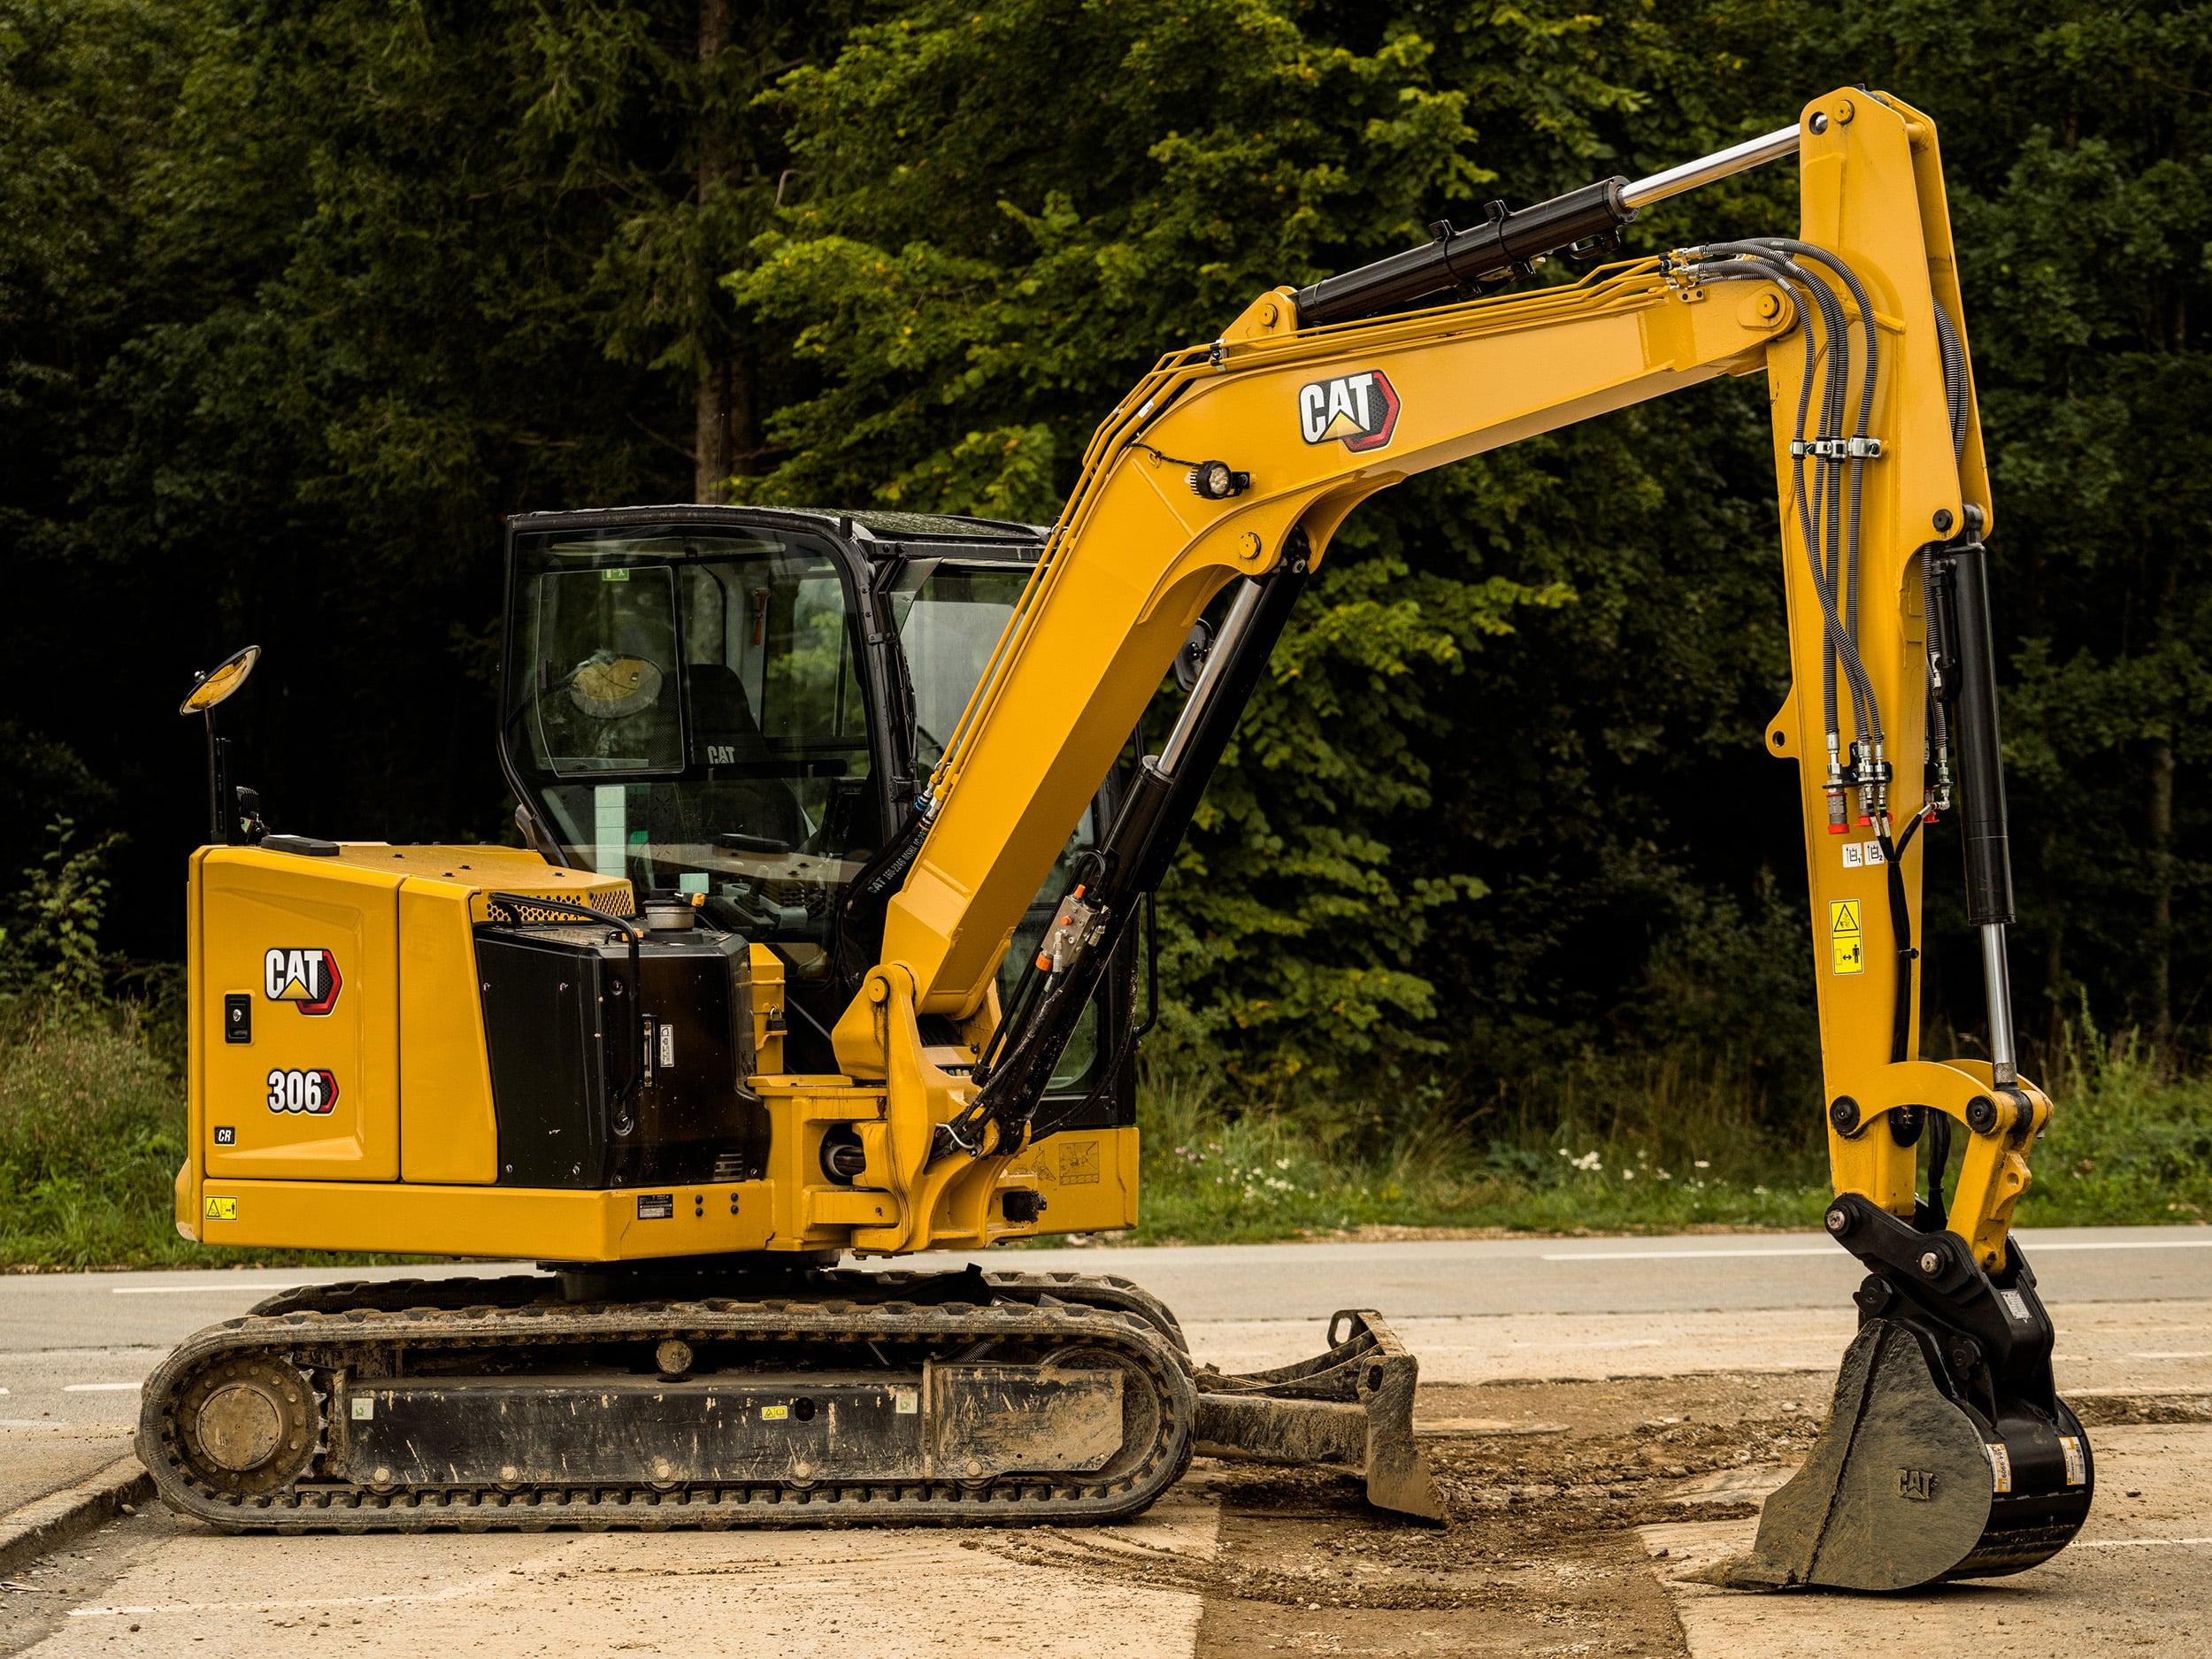 306 Excavator